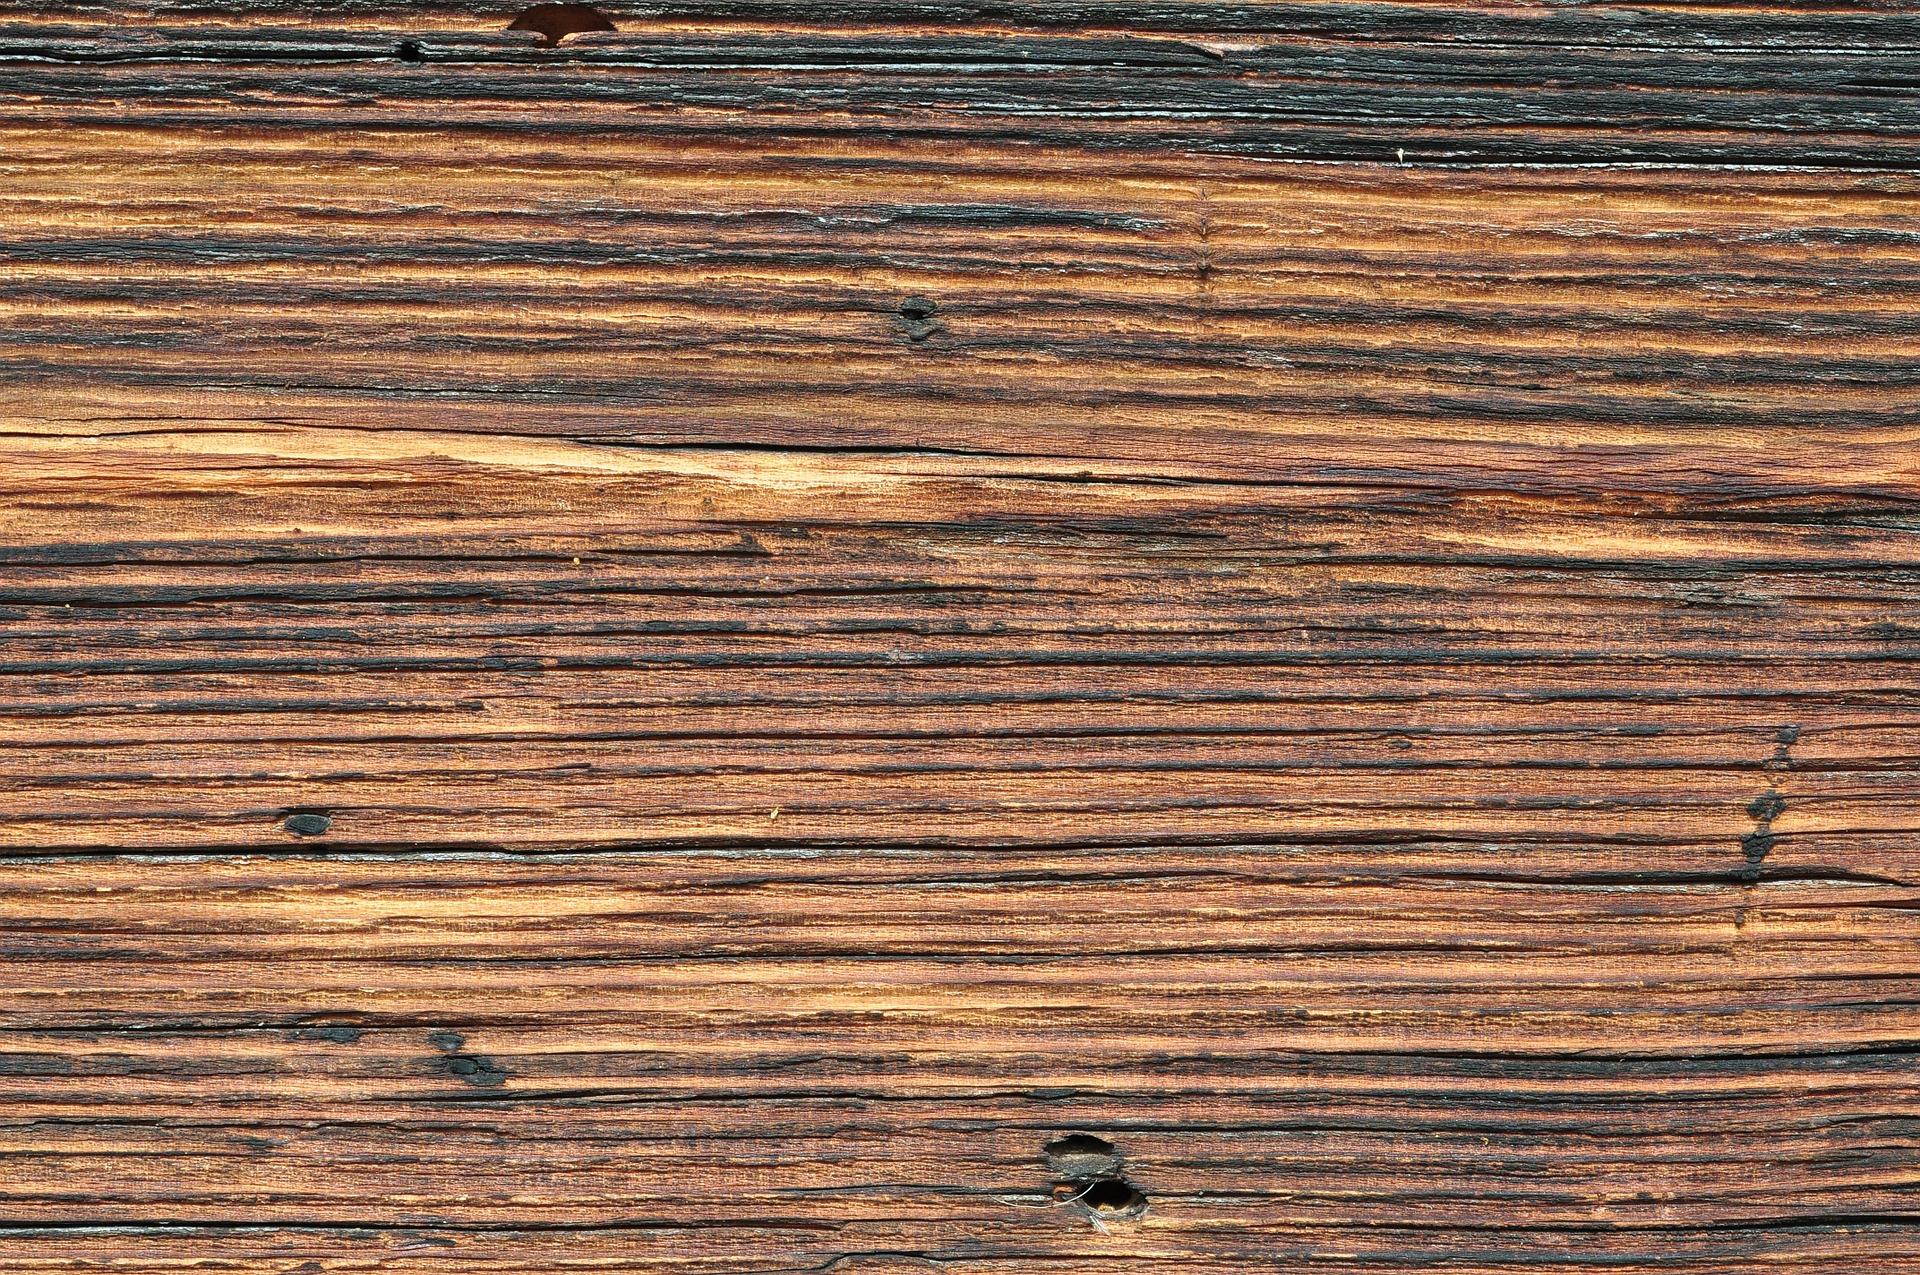 Wood, Brown, Craft, Crafting, Door, HQ Photo